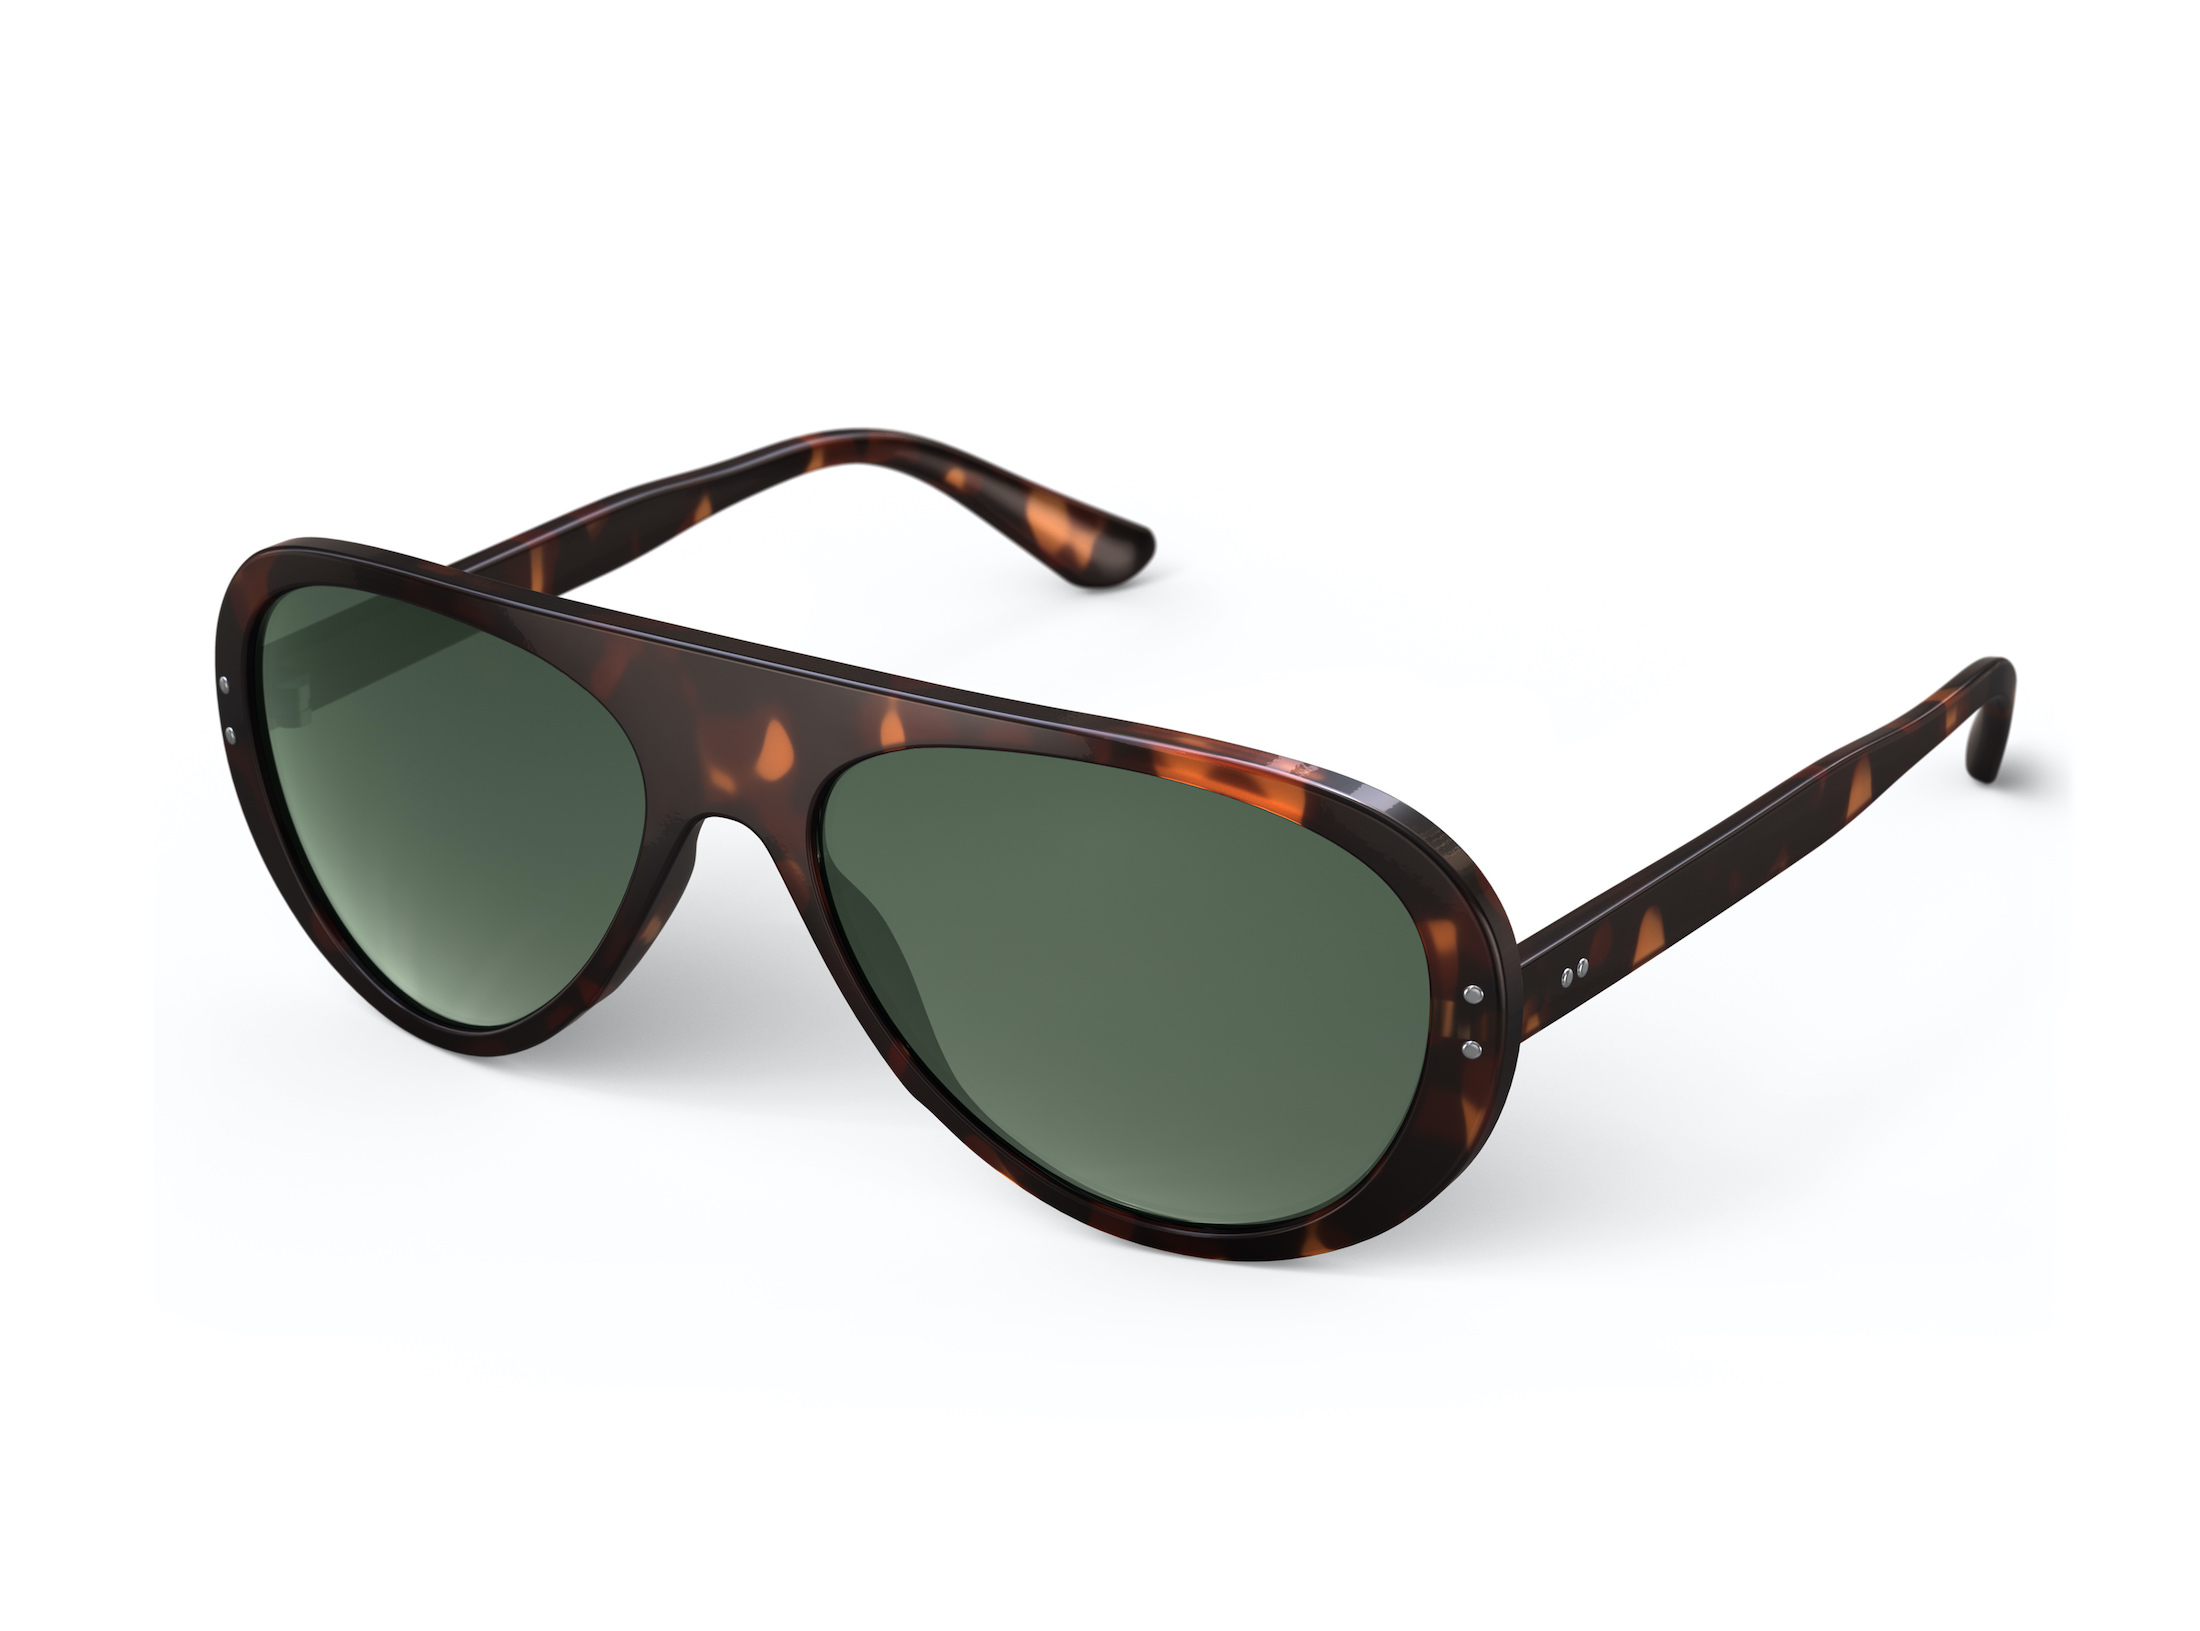 Surf Aviator Sunglasses by Vallon